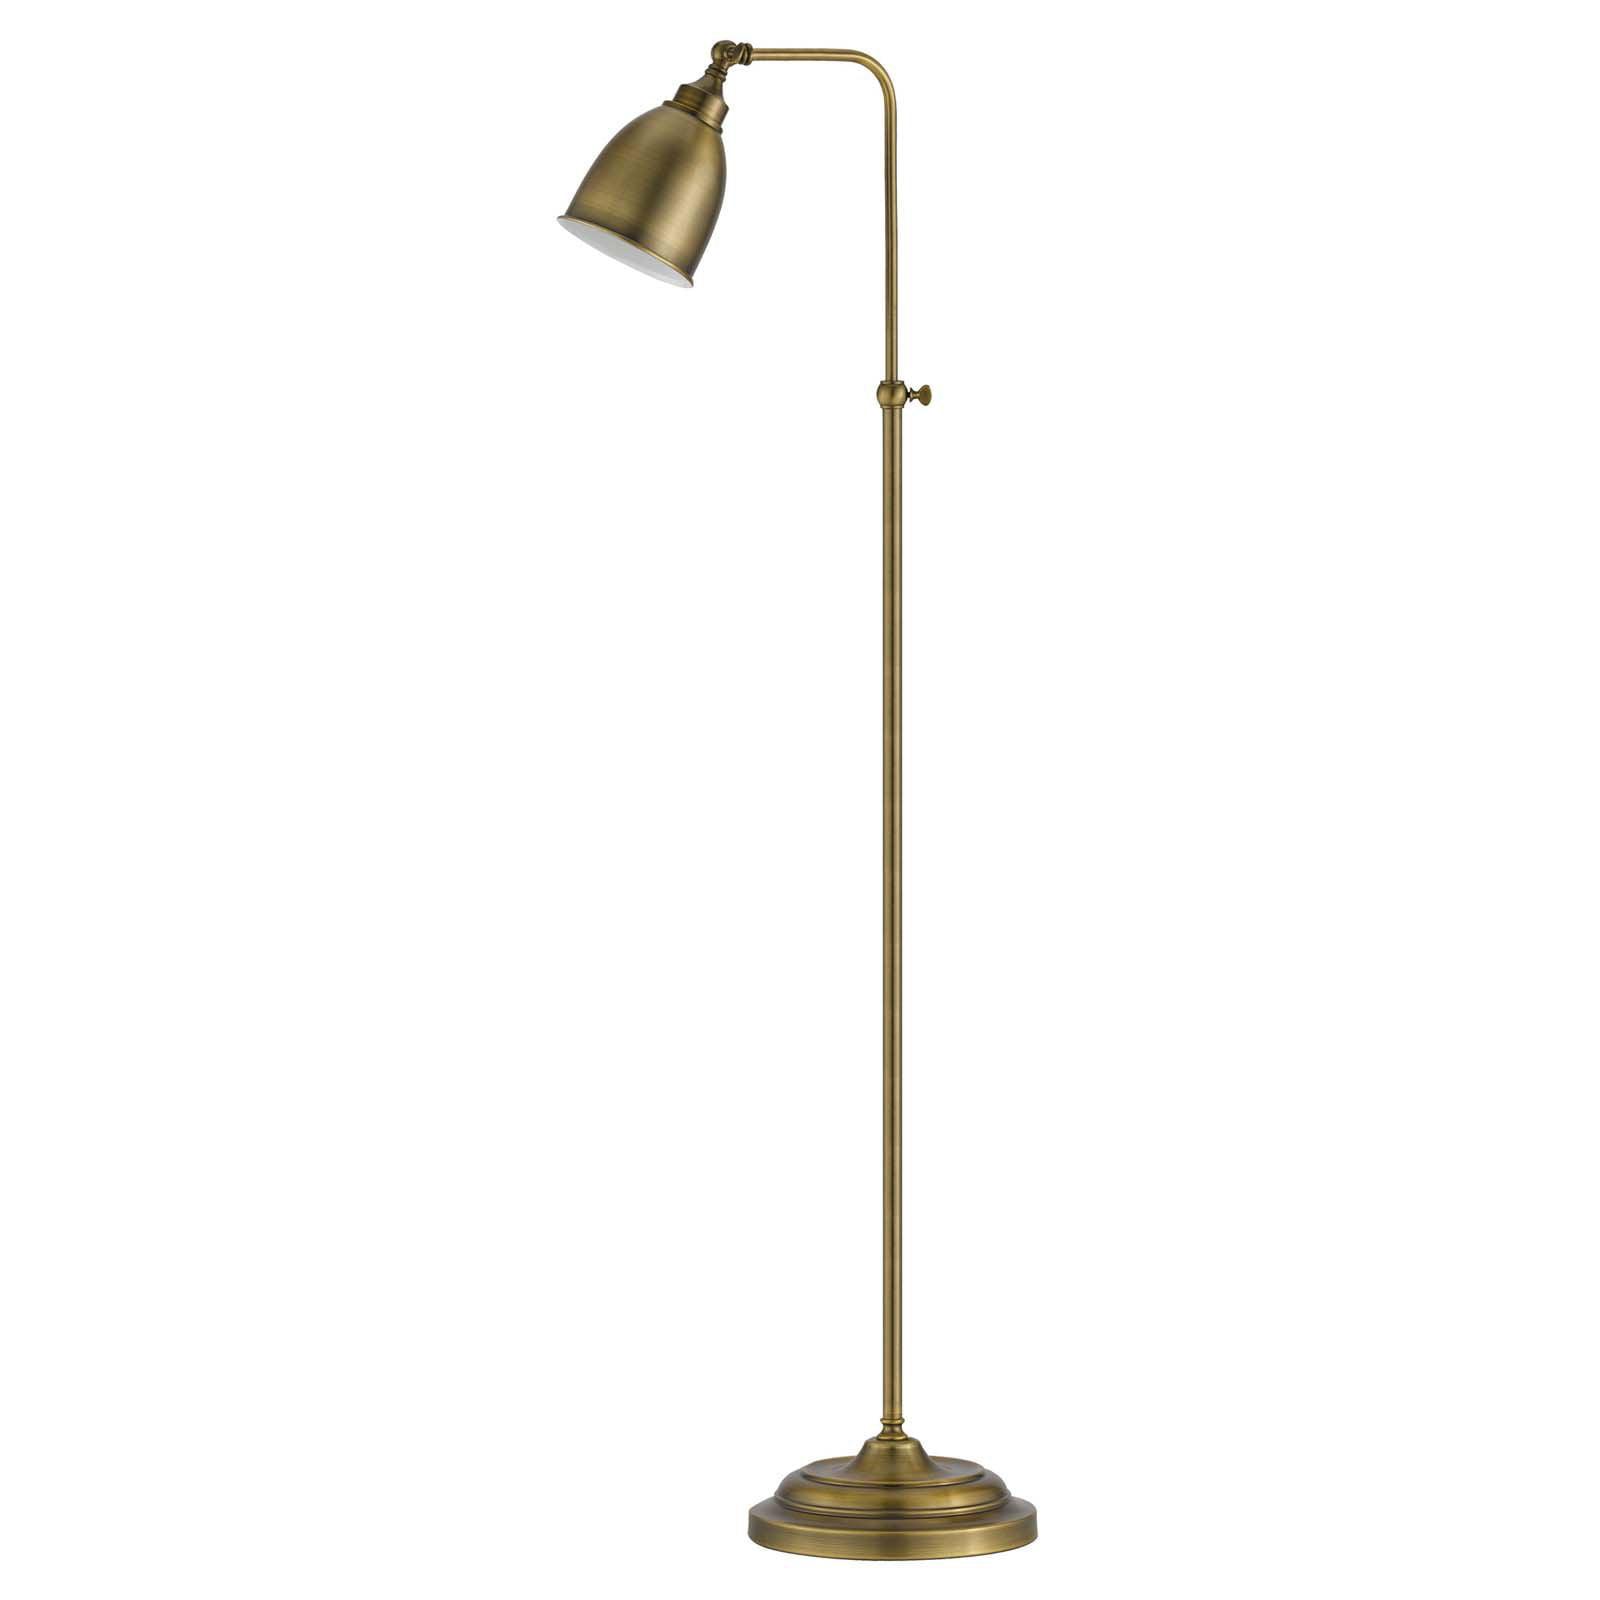 Cal Lighting BO-2032FL Pharmacy Floor Lamp with Adjustable Pole Antique Brass by CAL Lighting